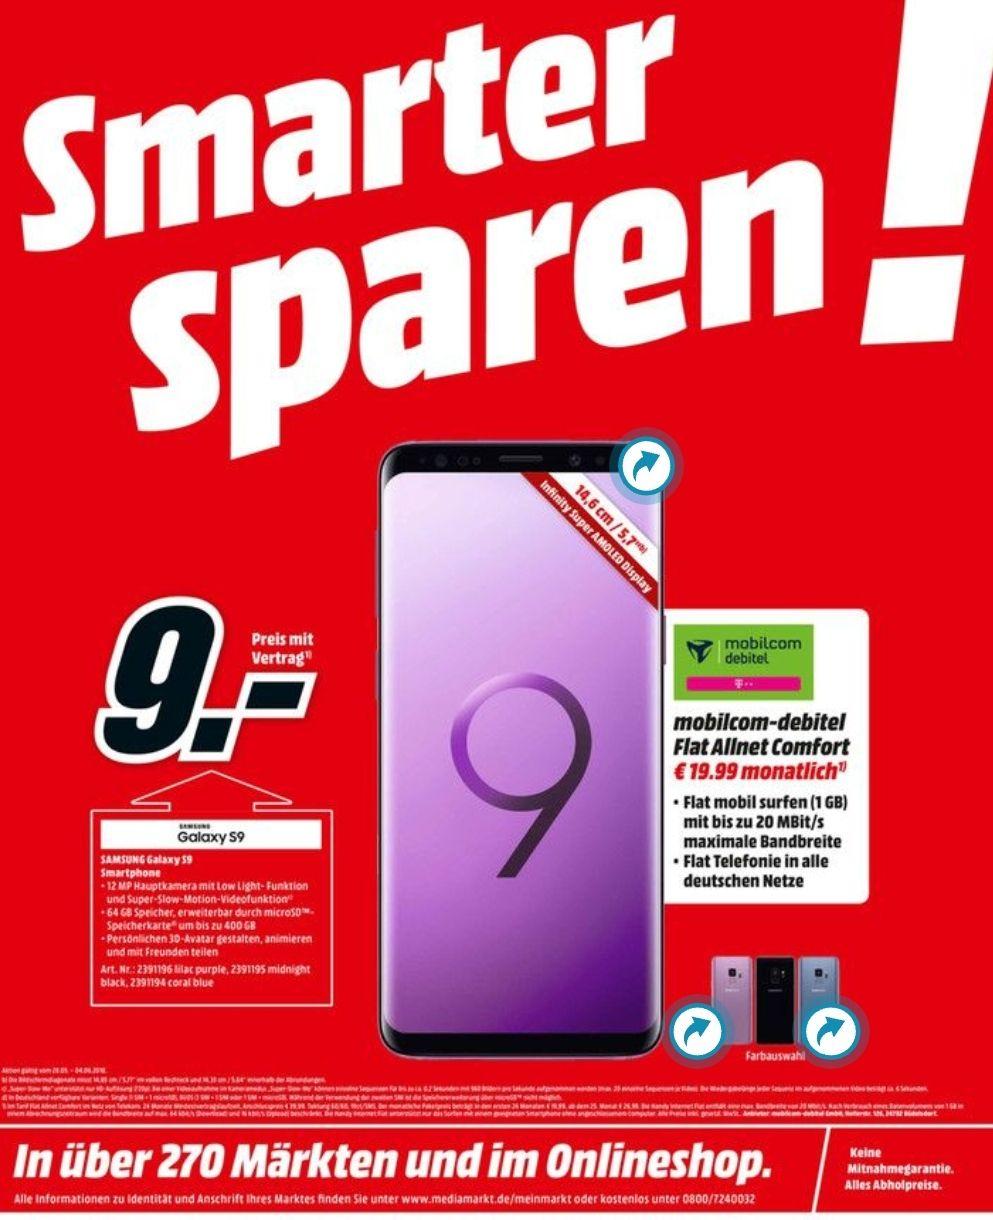 Lokal Ulm MM Galaxy S9 Schubladenvertrag